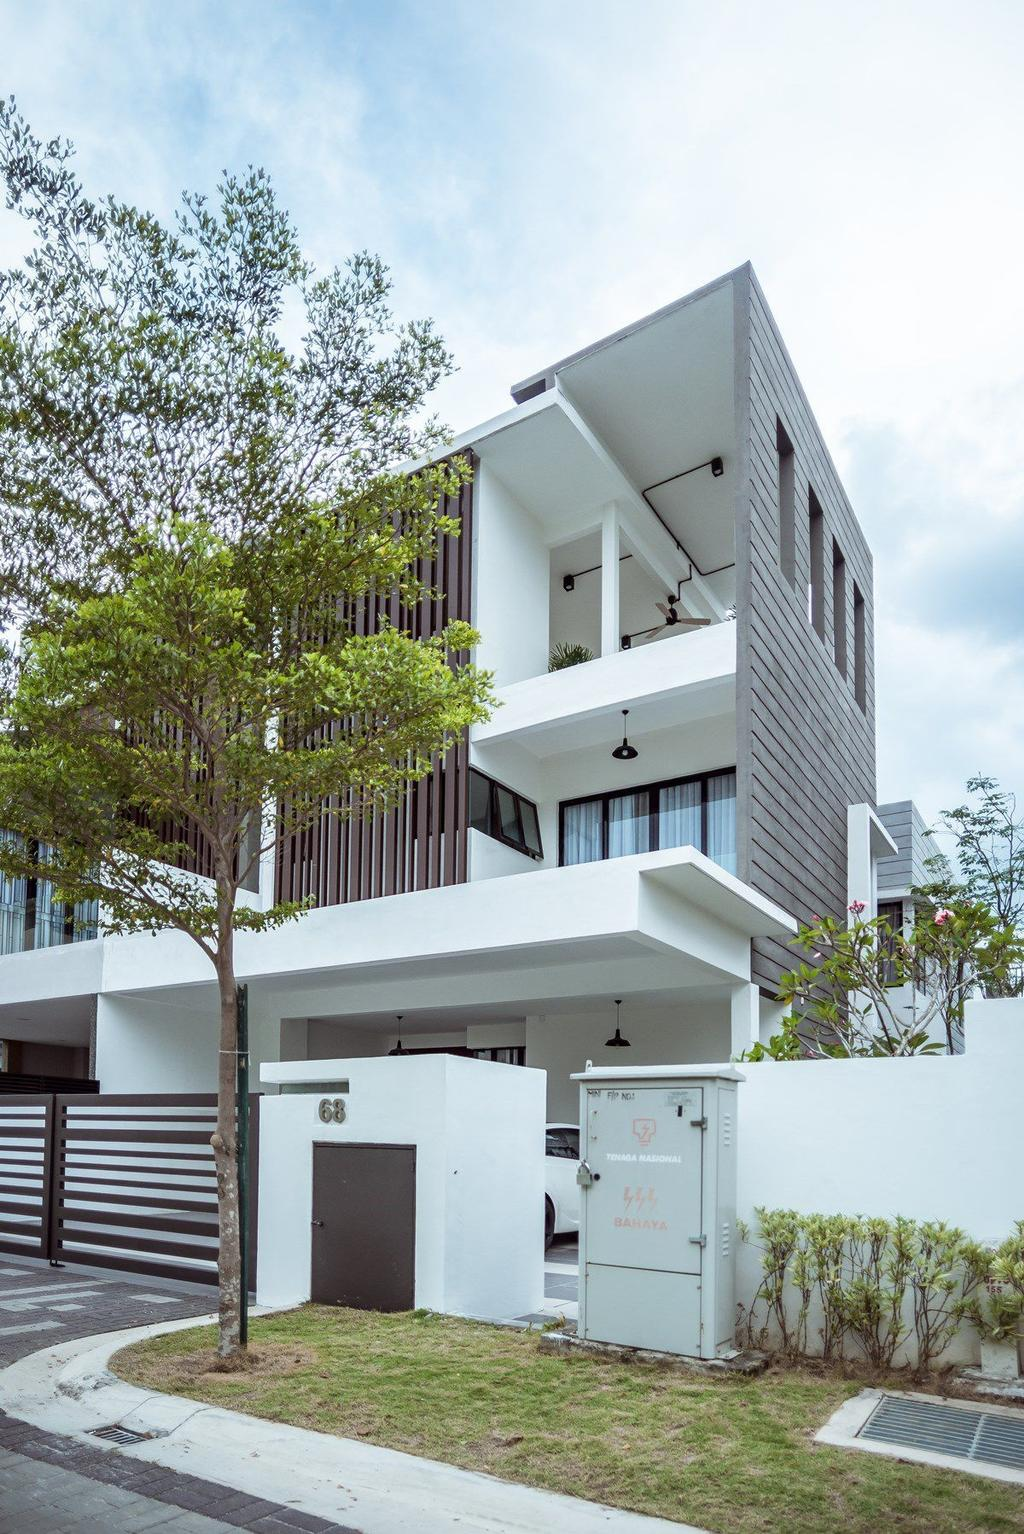 Contemporary, Landed, The Enclave, Ipoh, Architect, Code Red Studio, Flora, Jar, Plant, Potted Plant, Pottery, Vase, Building, House, Housing, Villa